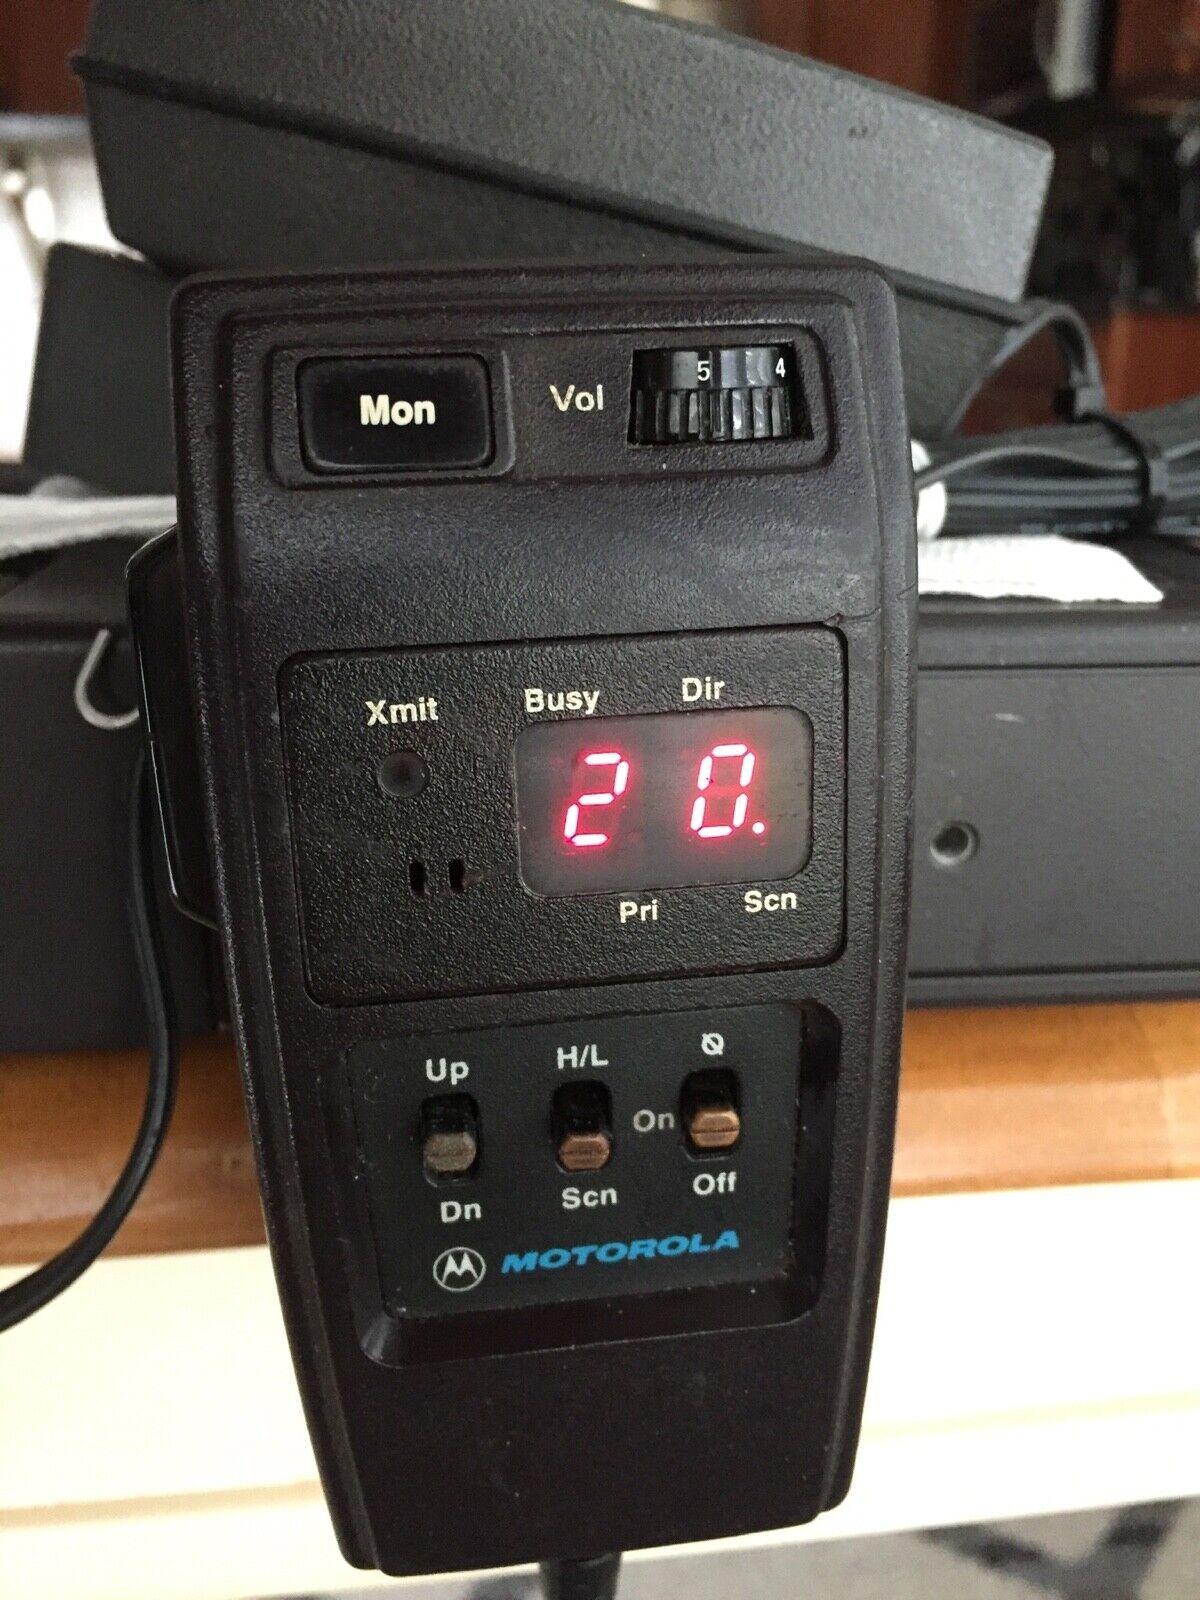 Motorola Spectra A3 VHF 50watt Mobile Radio 136-174 MHz D43KXA7JA3BK HHCH Model. Buy it now for 99.00